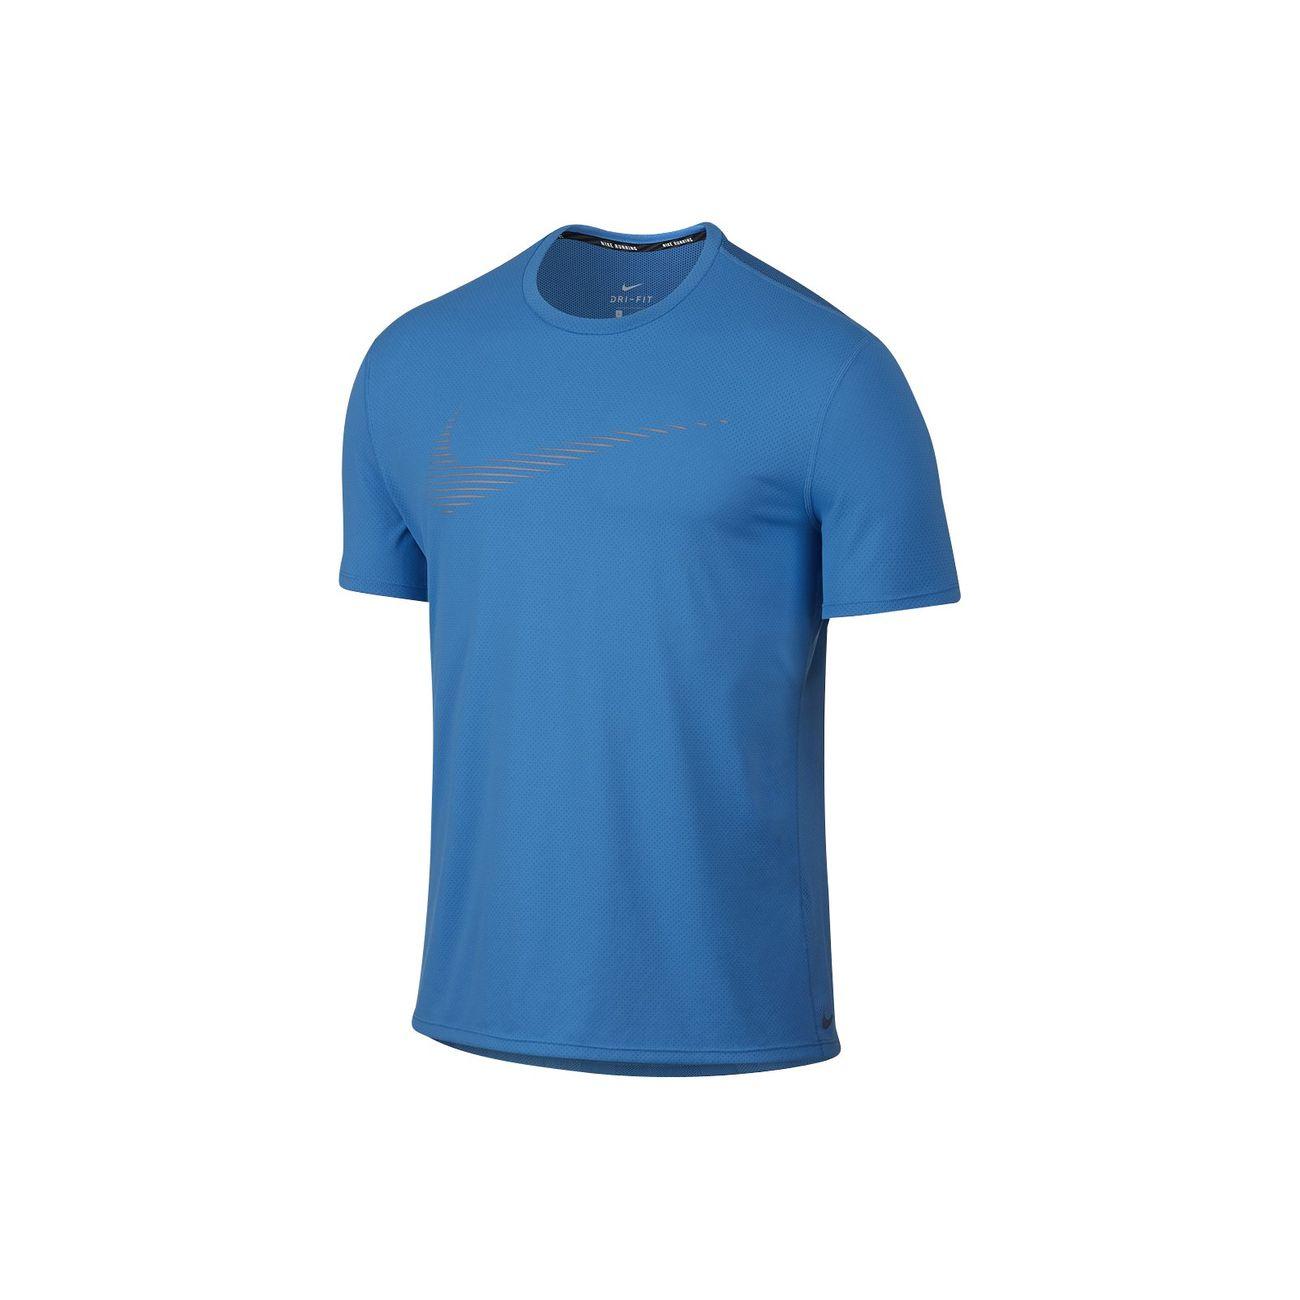 Courtes Homme Dry Nike Manches Multisports Shirts Bleu T Contour UnqnxO